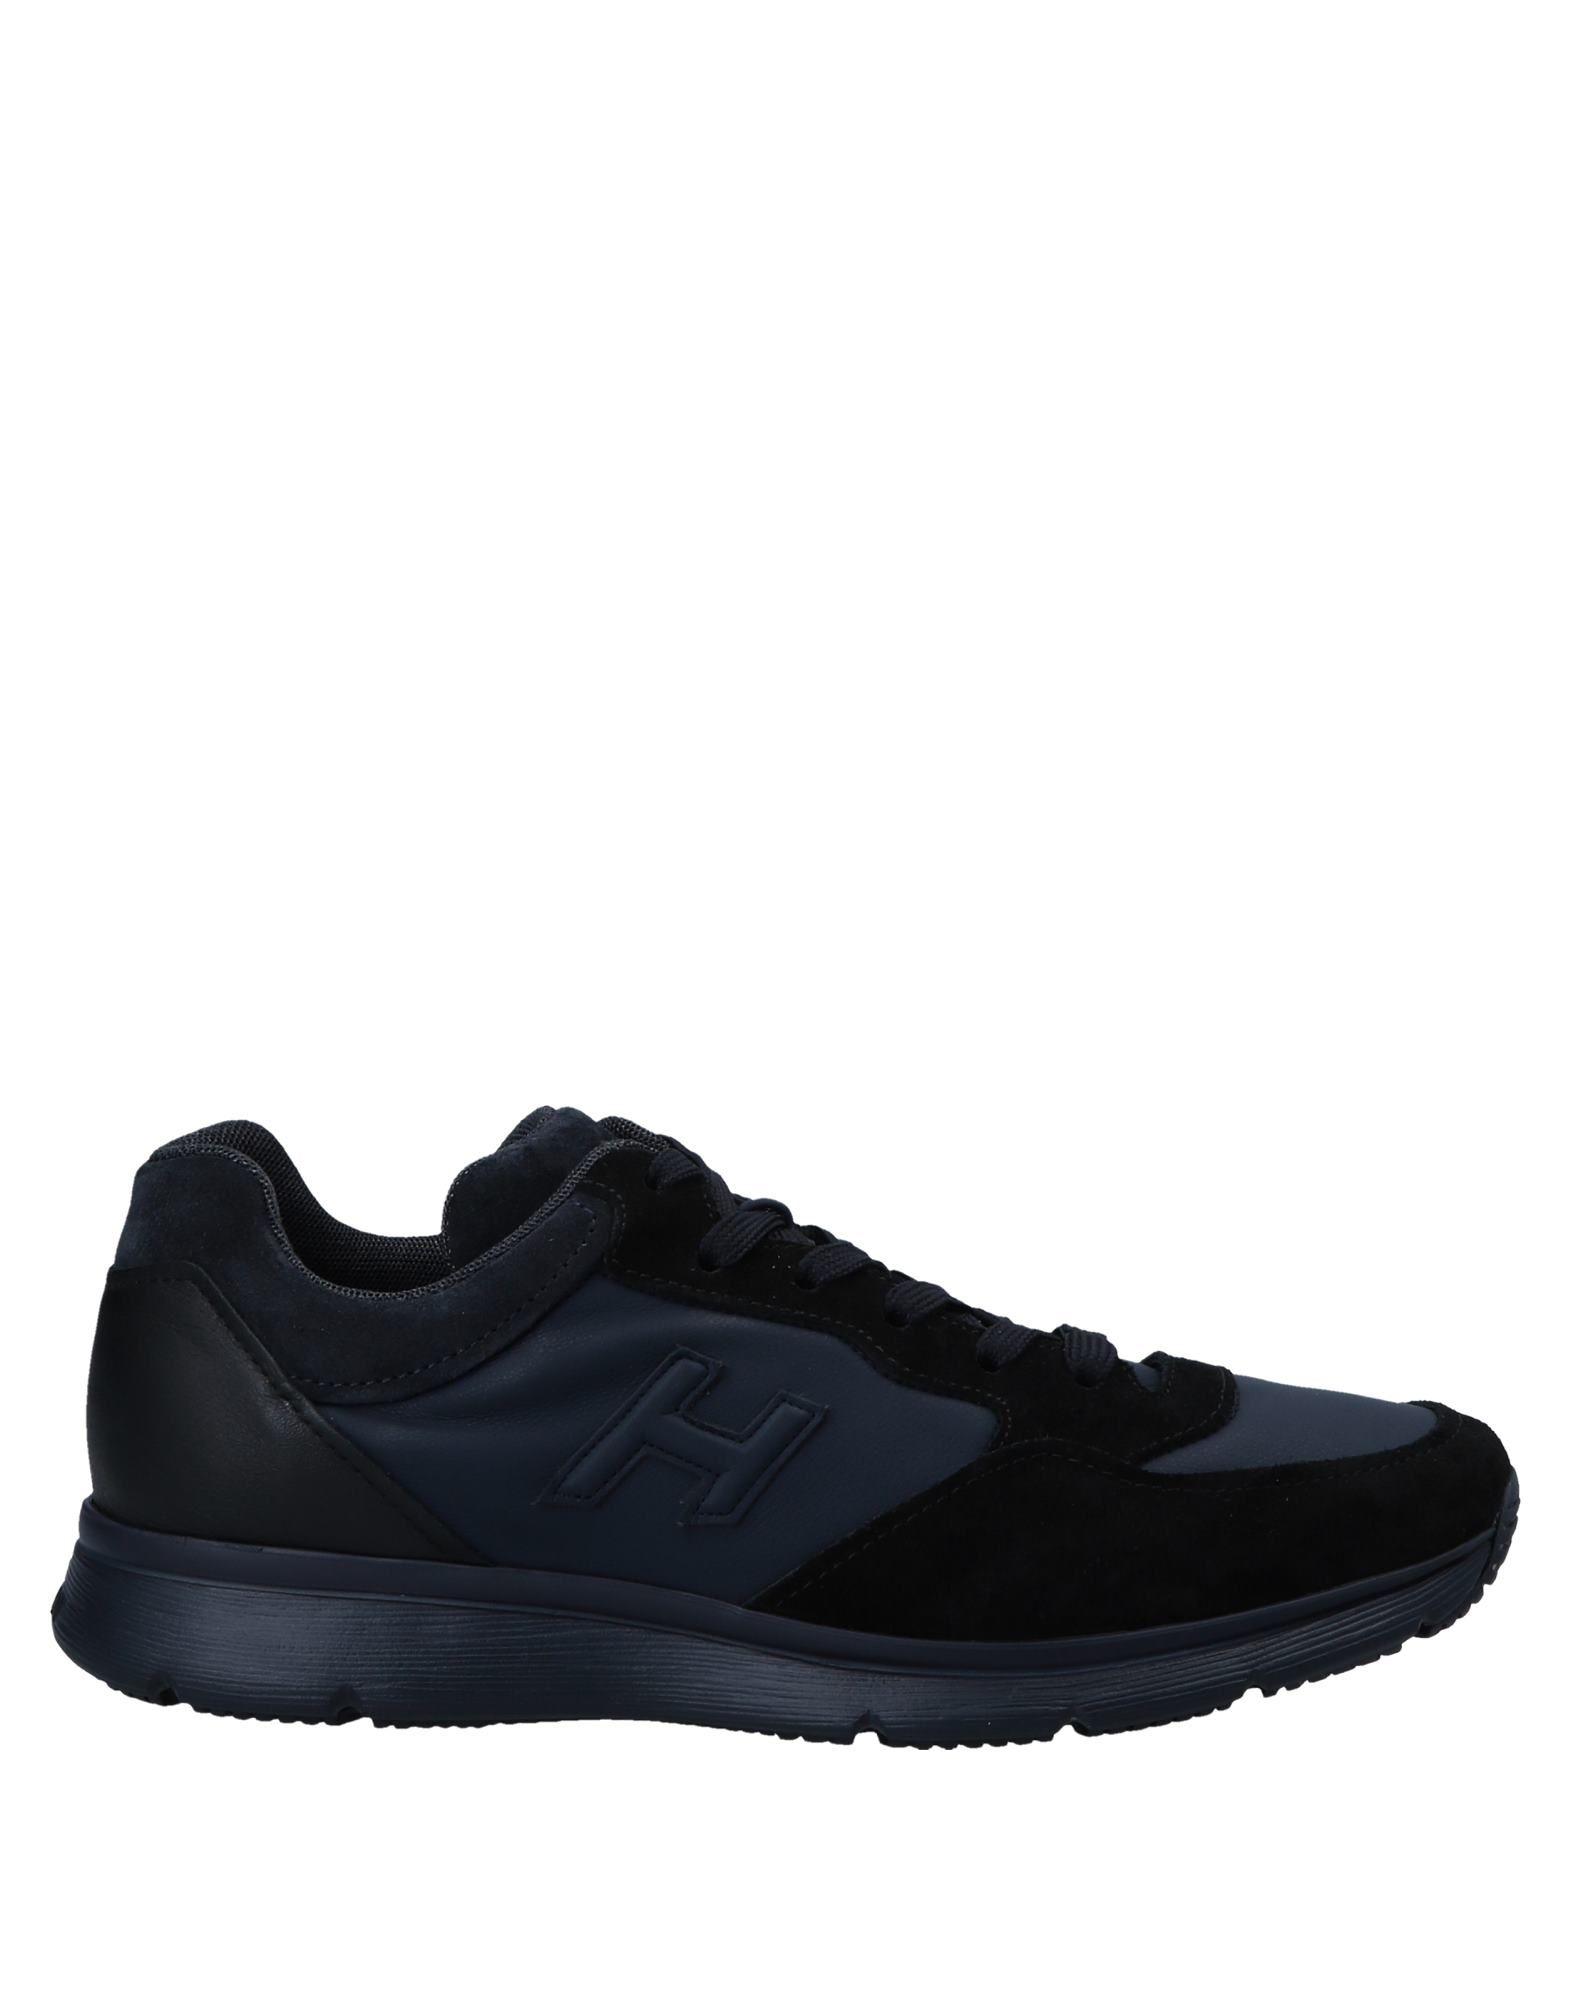 Sneakers Hogan Uomo - 11559307NB elegante